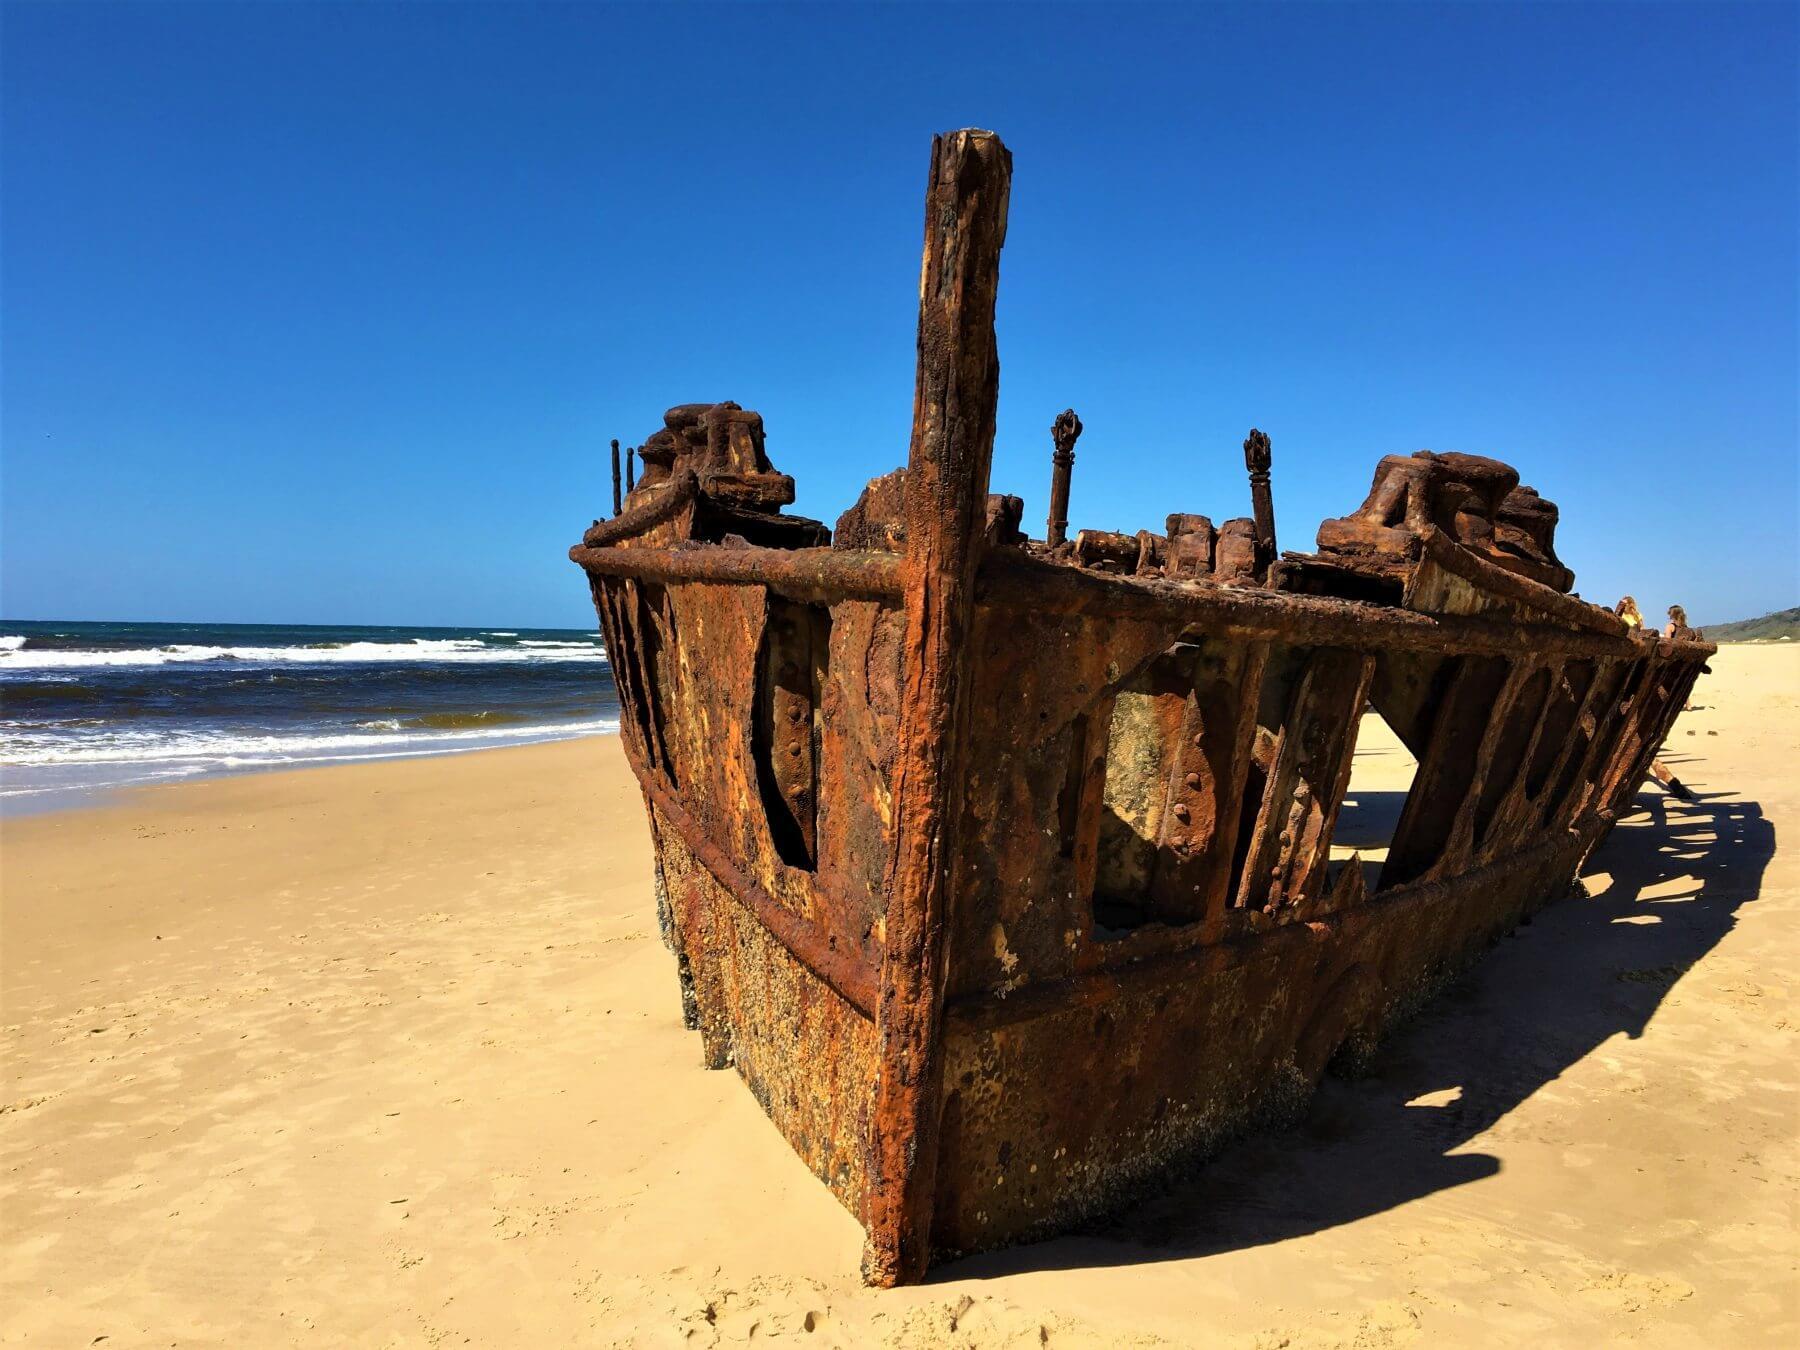 Schiffswrack Maheno Wreck auf Fraser Island